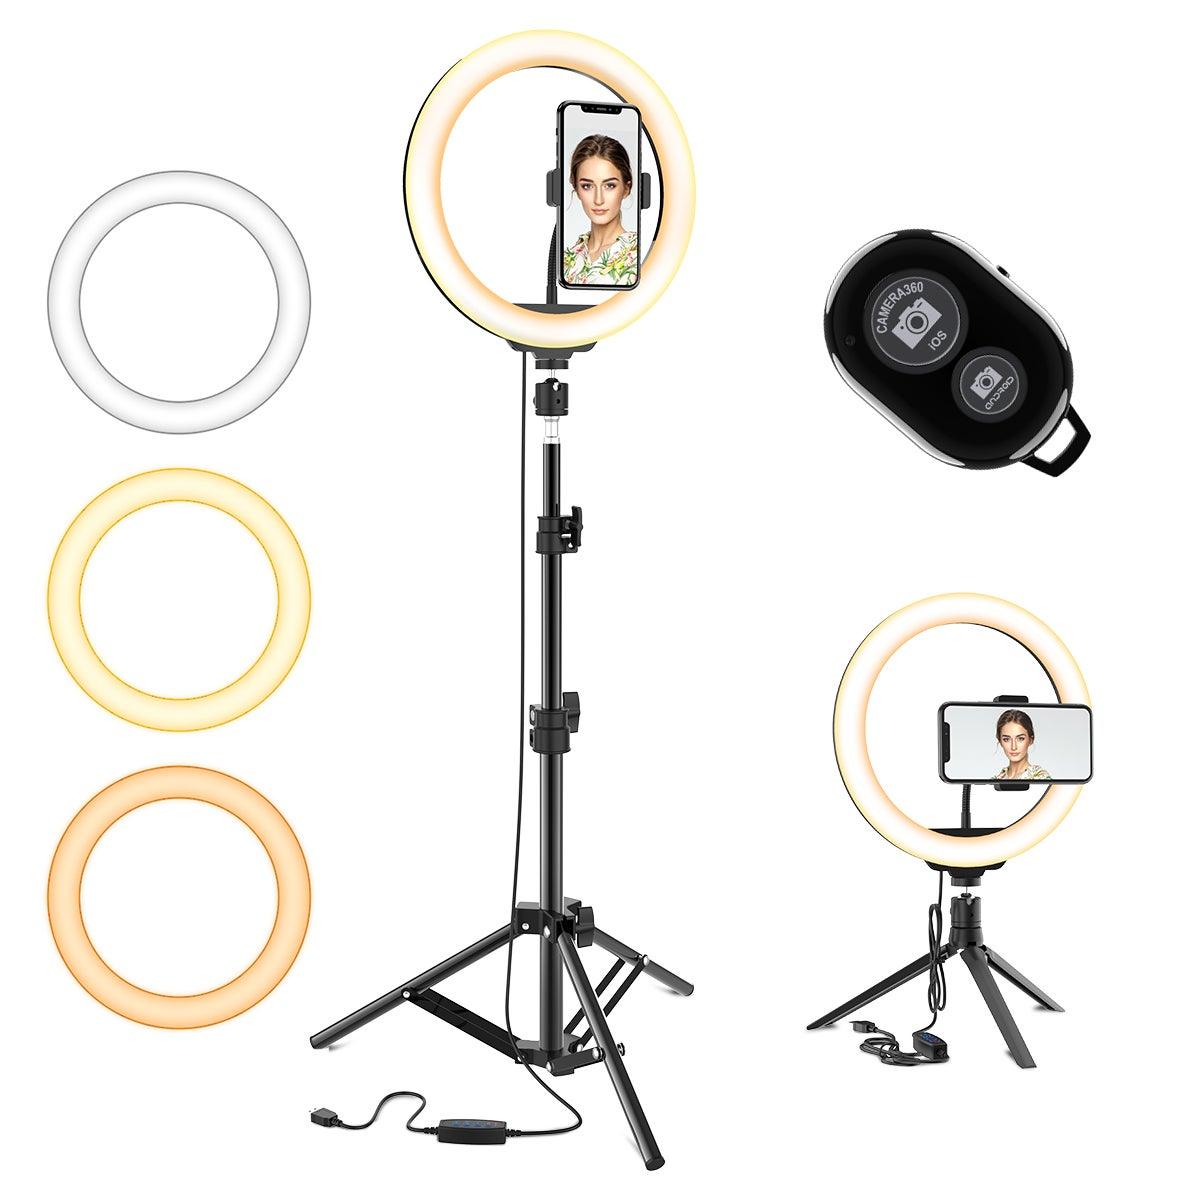 10.2 Selfie Ring Light w/ Tripod Stand & Phone Holder